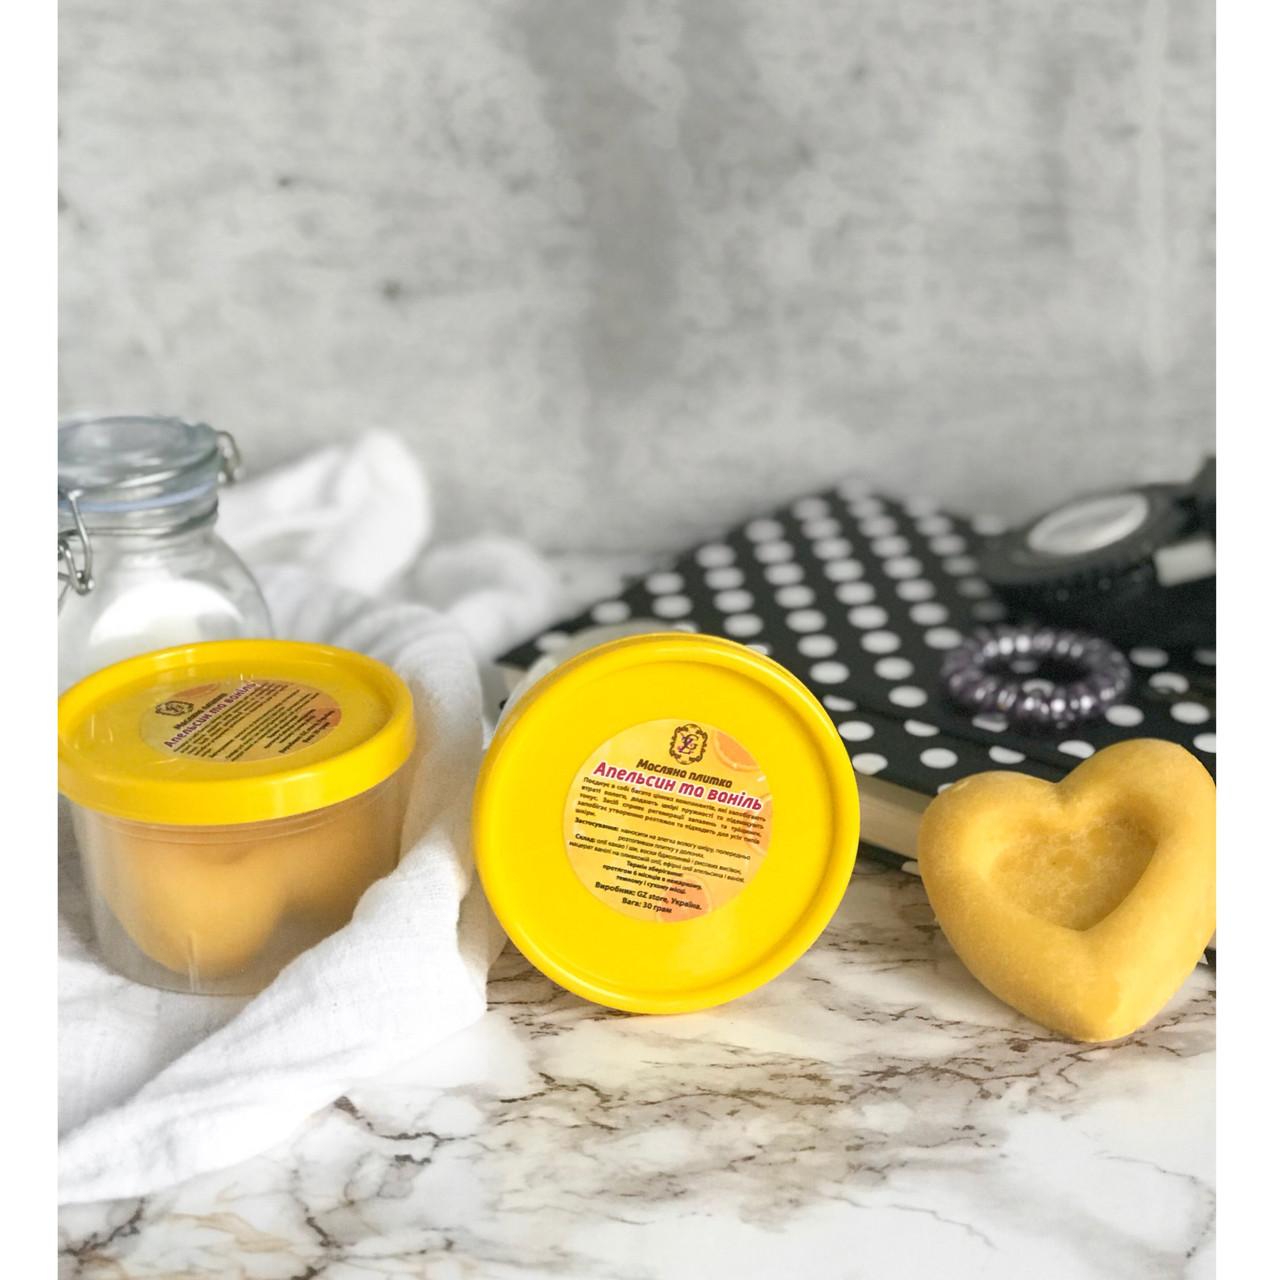 Масляная плиточка-баттер Апельсин с ванилью 30г - для тела, рук, ног, губ - от сухости, шелушений